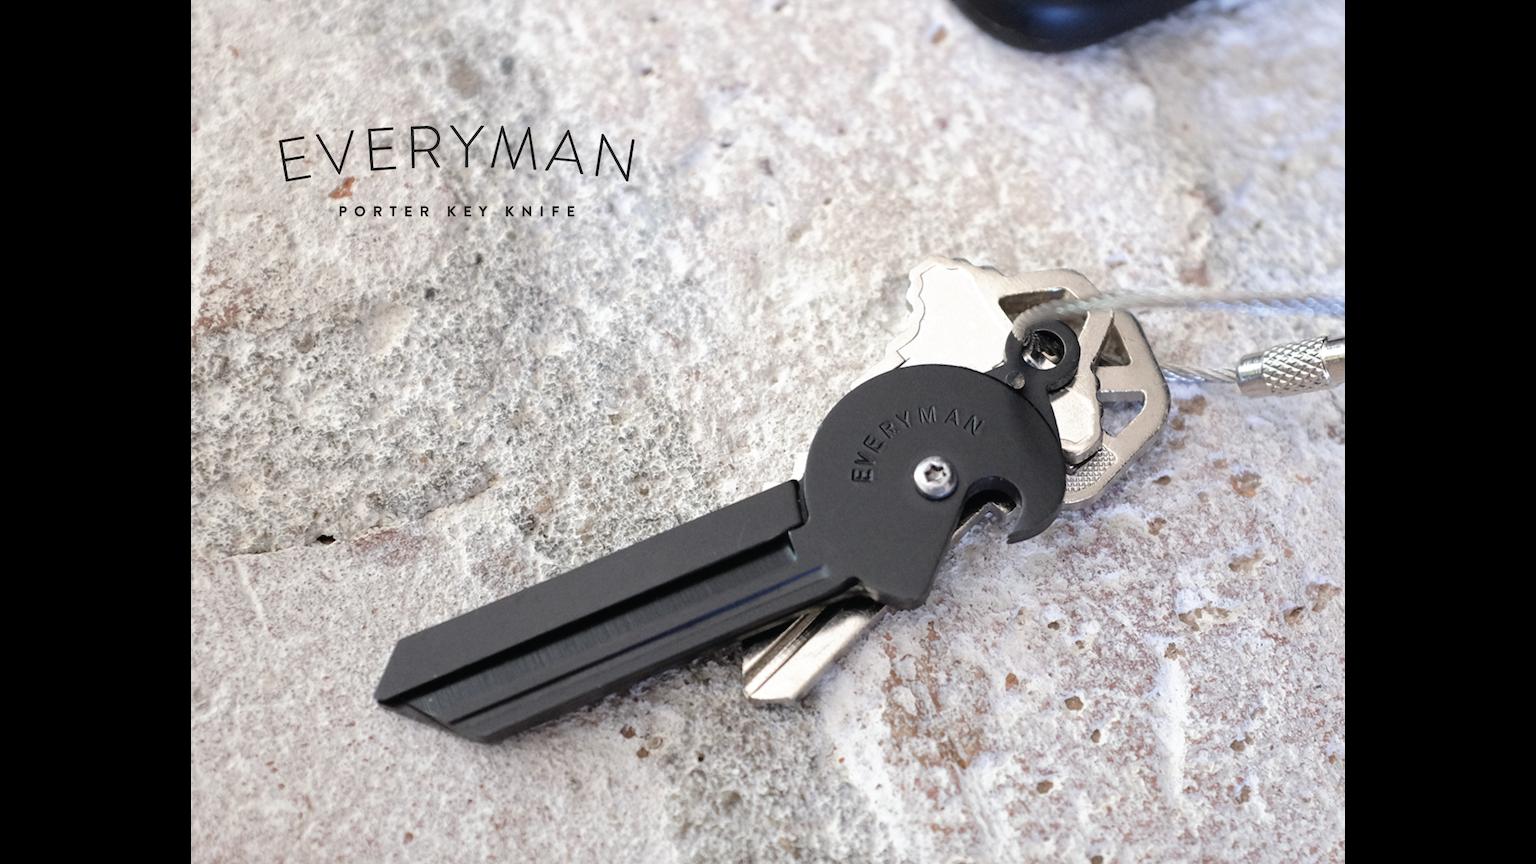 porter key knife bottle opener edc multi tool by everyman kickstarter. Black Bedroom Furniture Sets. Home Design Ideas